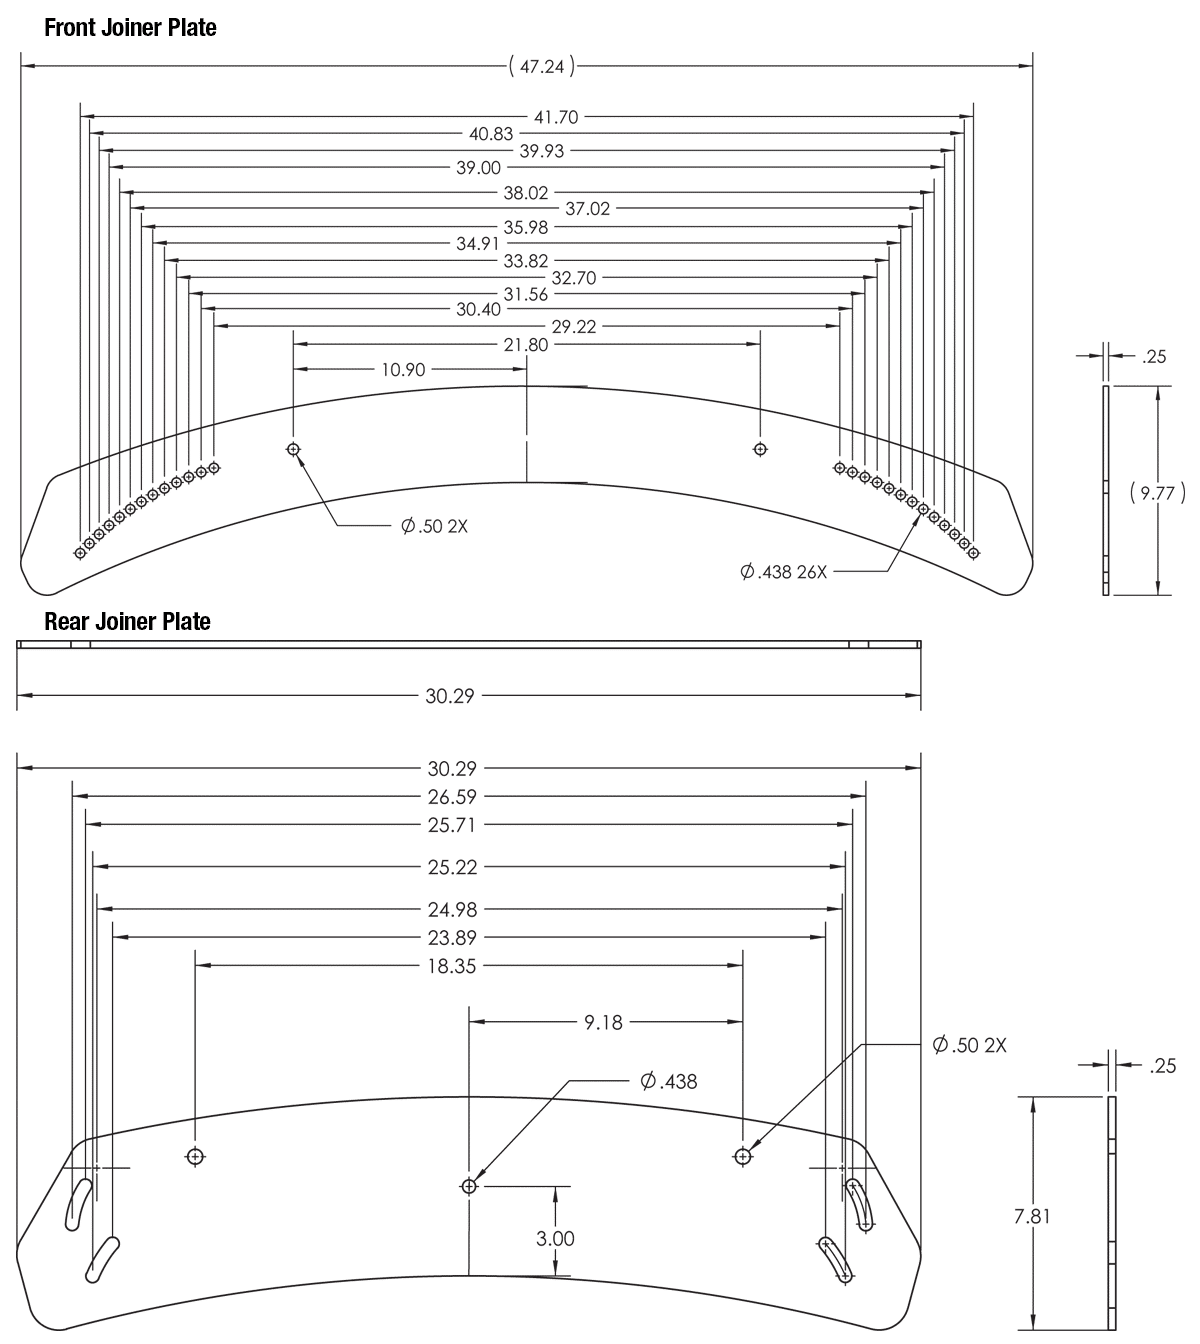 FP-EVFS2-3X1-Drawings